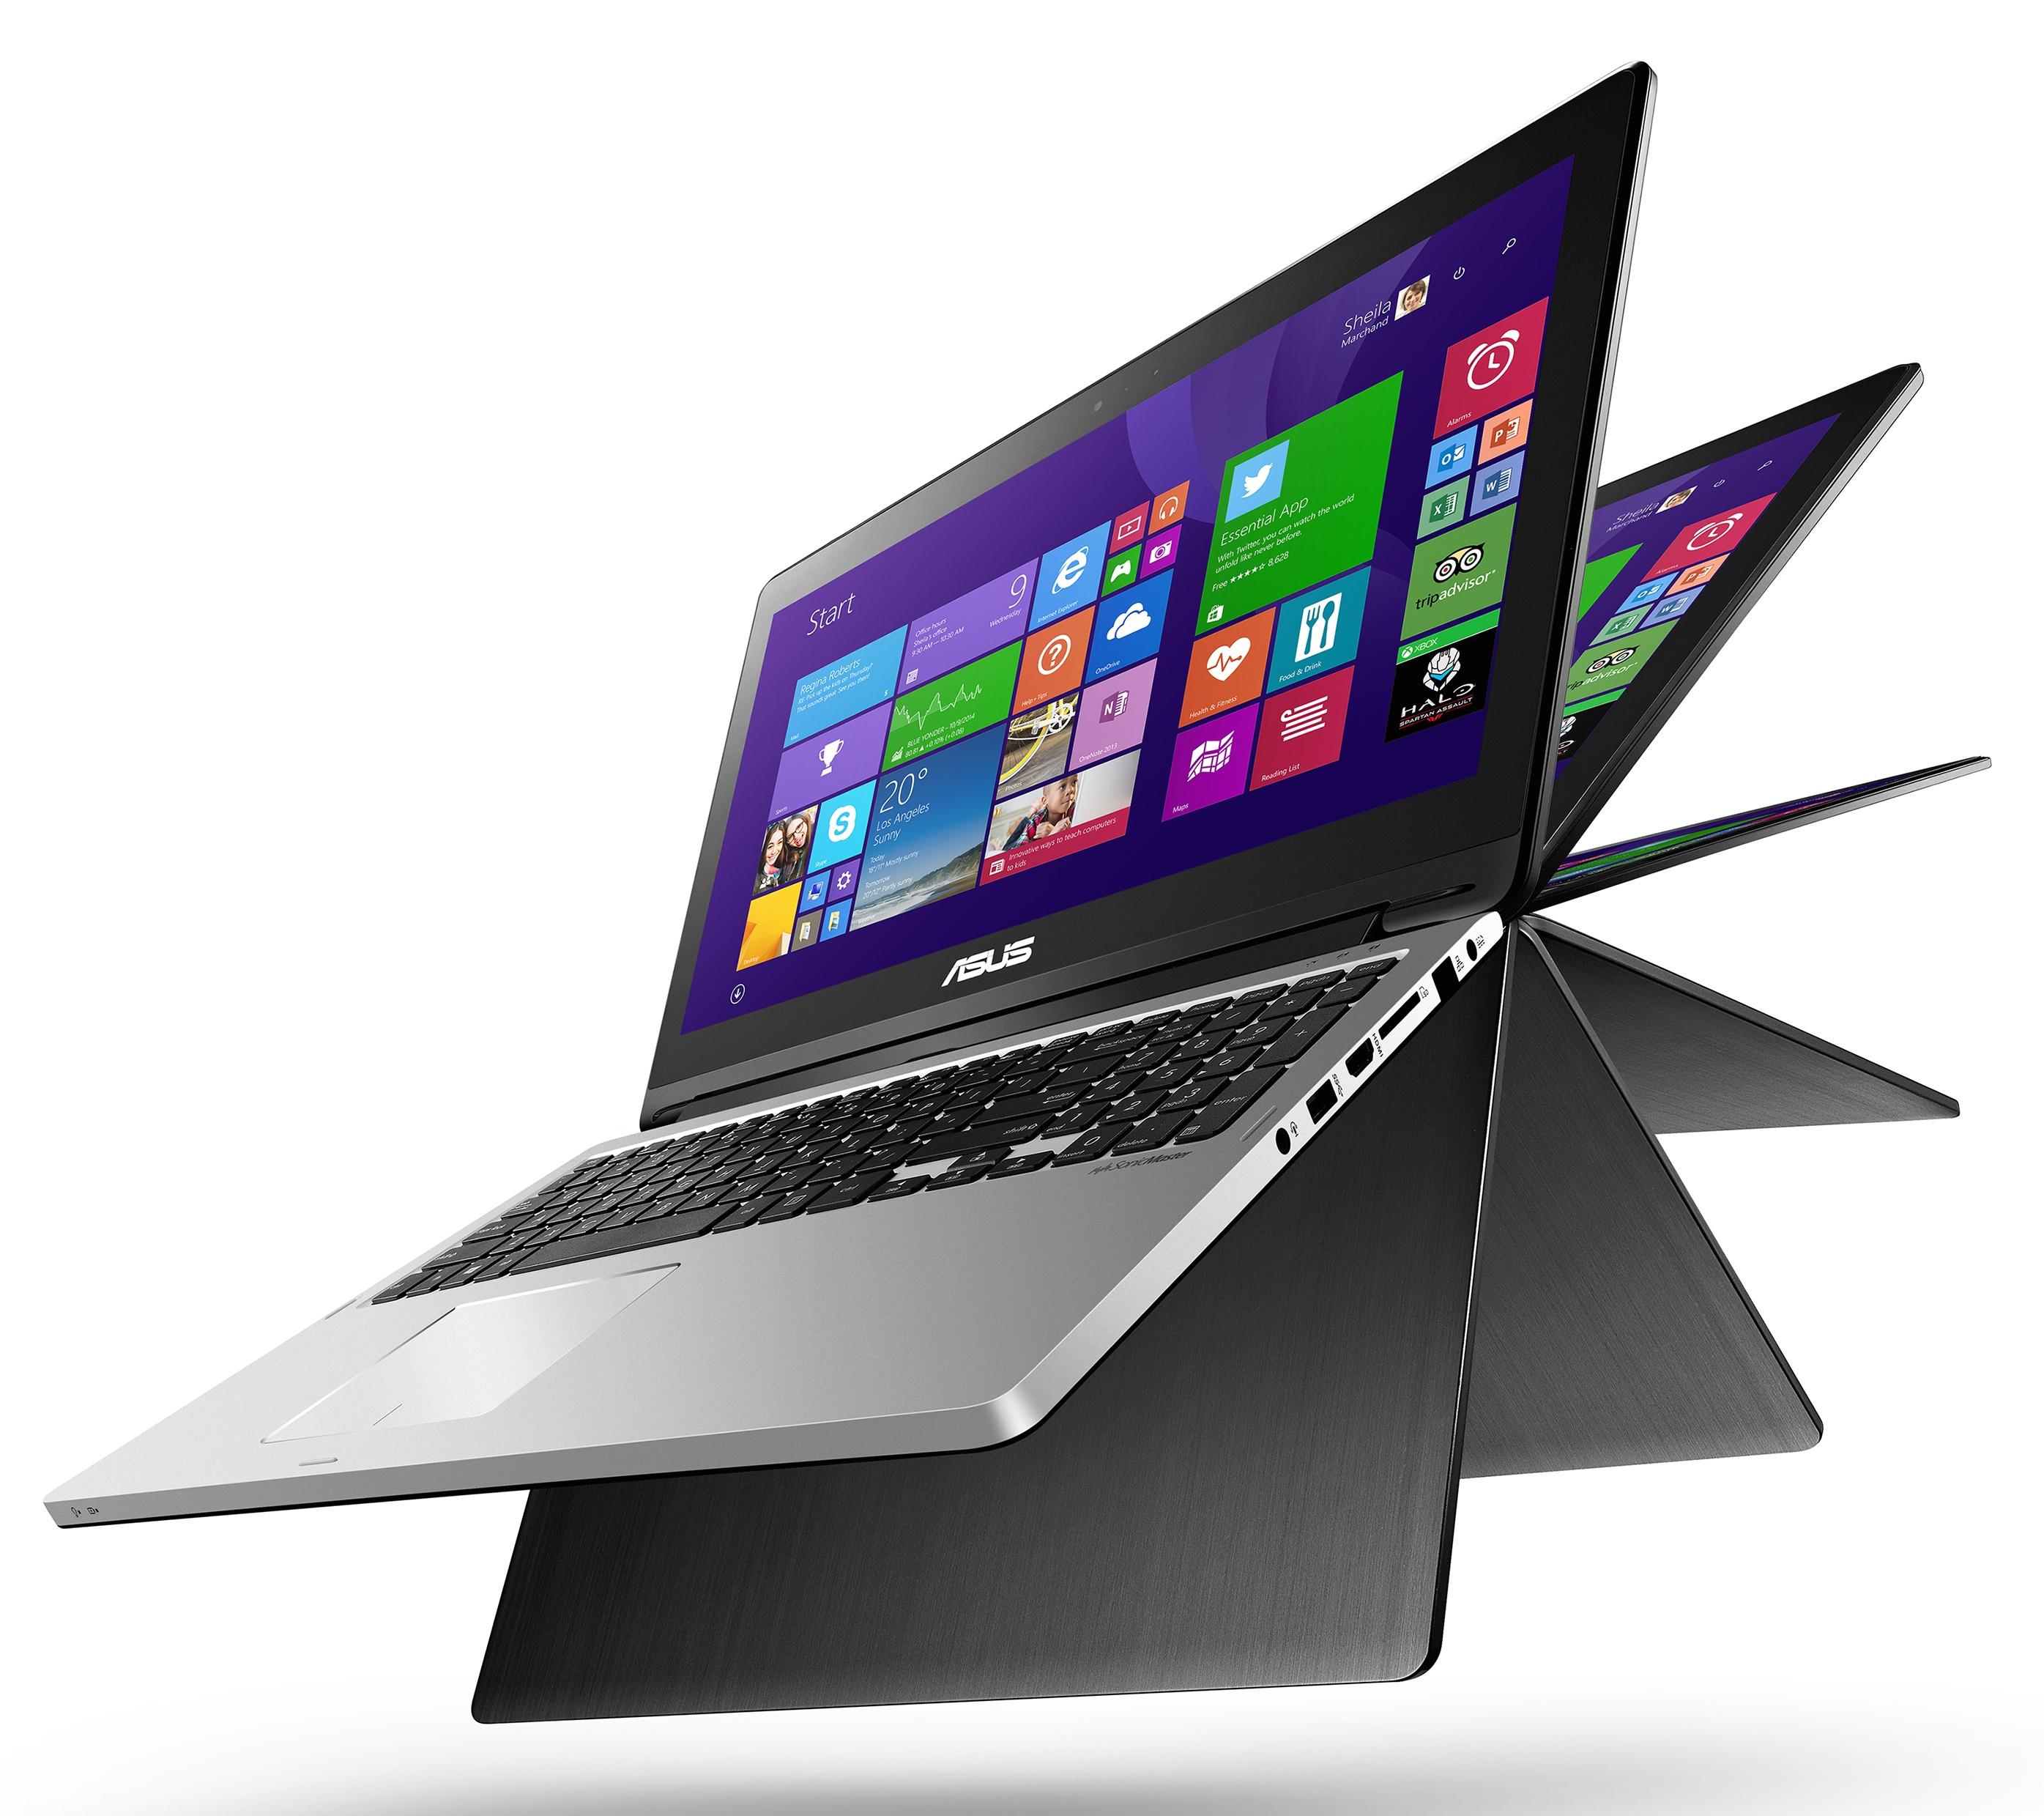 Laptop Asus TP300LA-DW060H Core i3 4030U 4GB/500GB/13.3